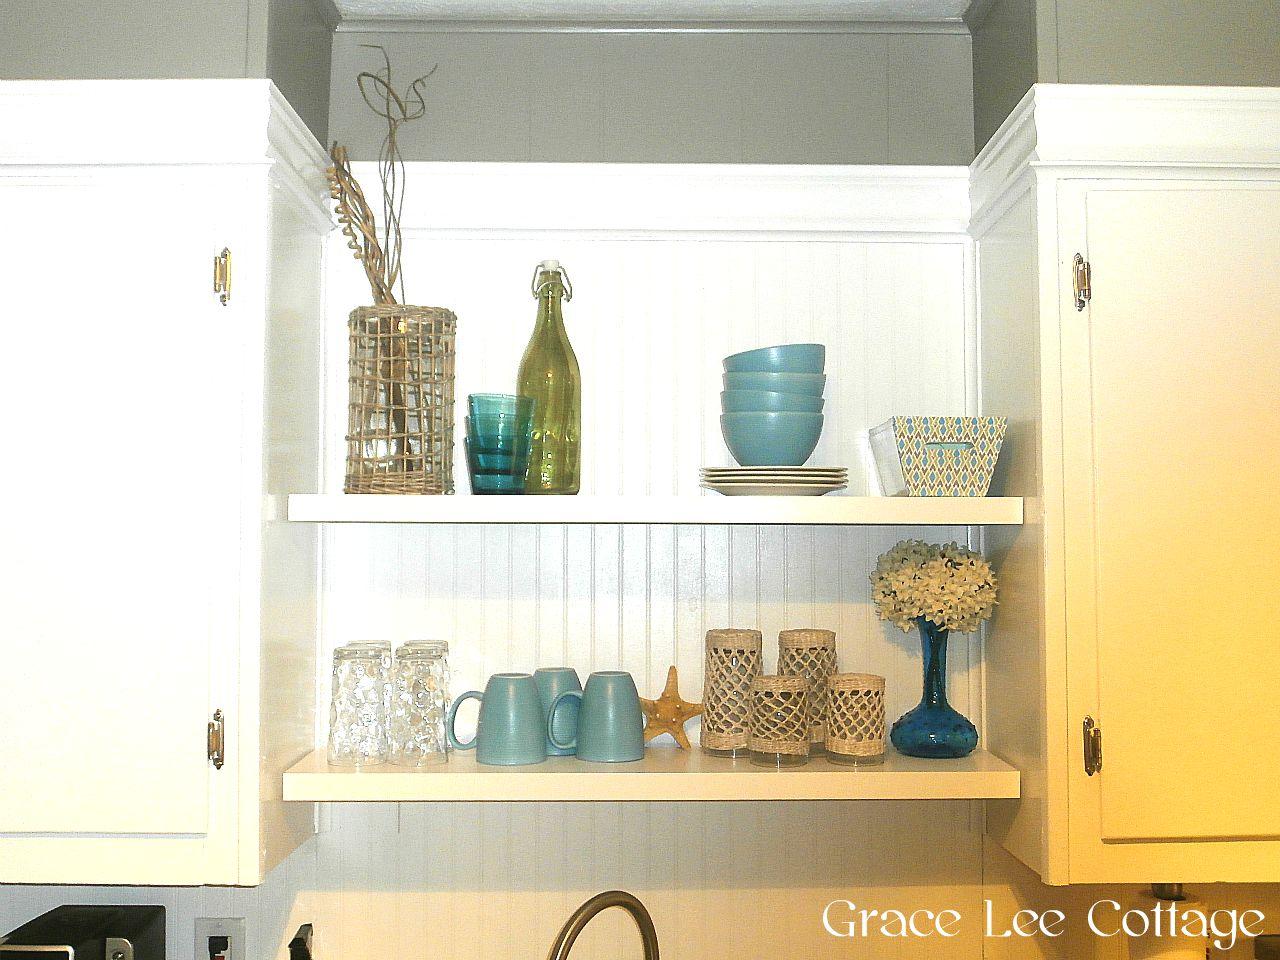 Shelf Over Kitchen Sink Between Cabinets